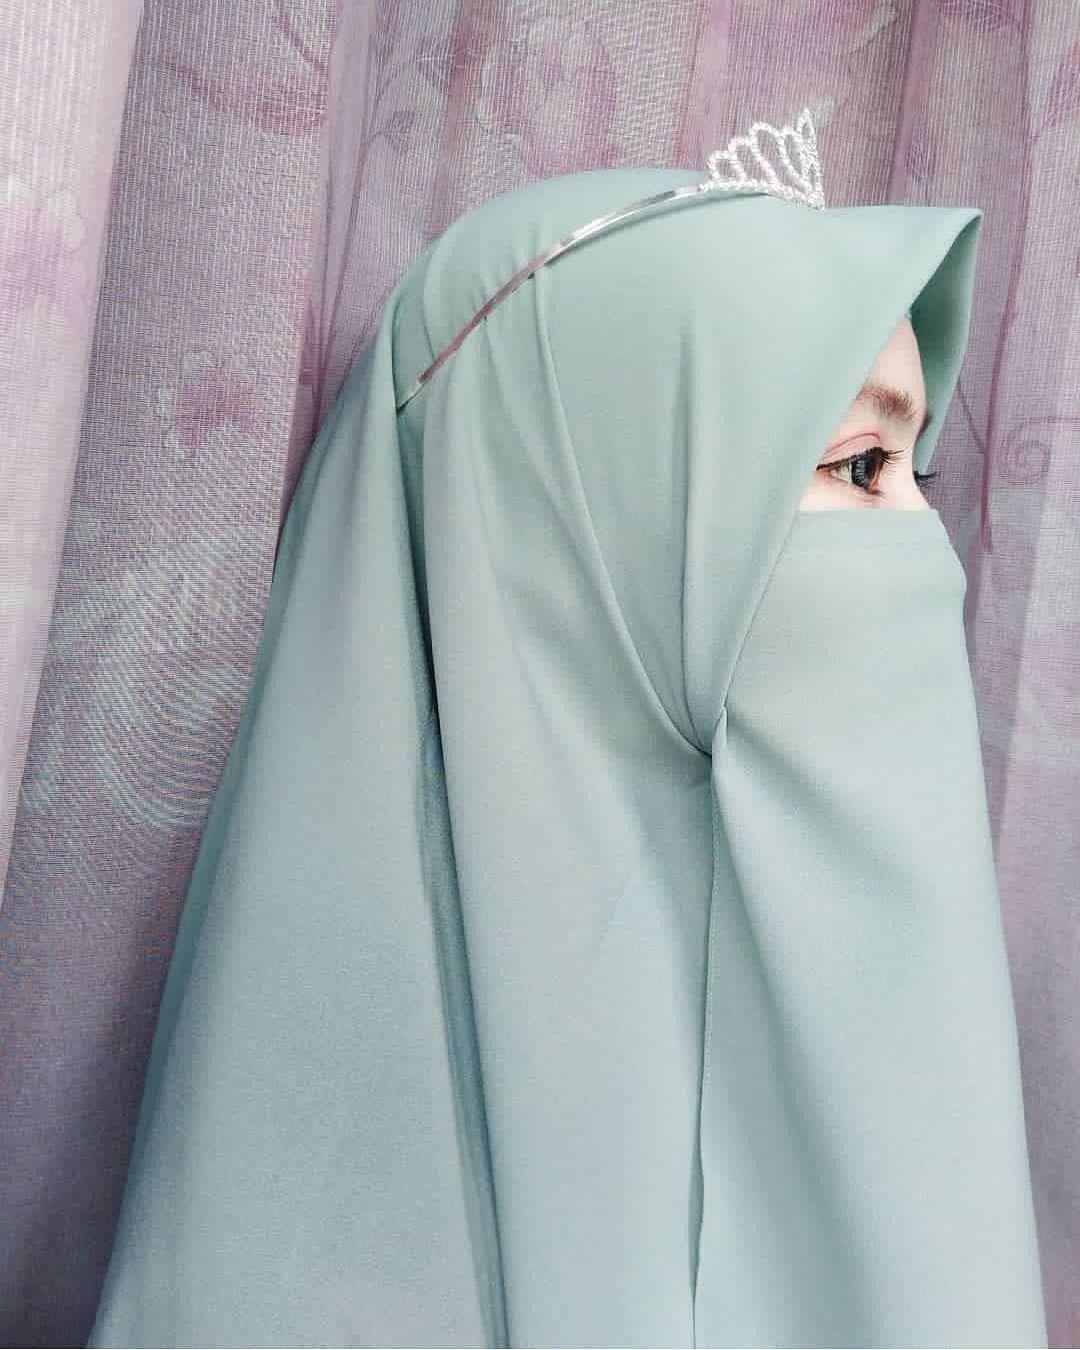 Gambar oleh Arsy Nya pada Niqab di 2020 Gaya model